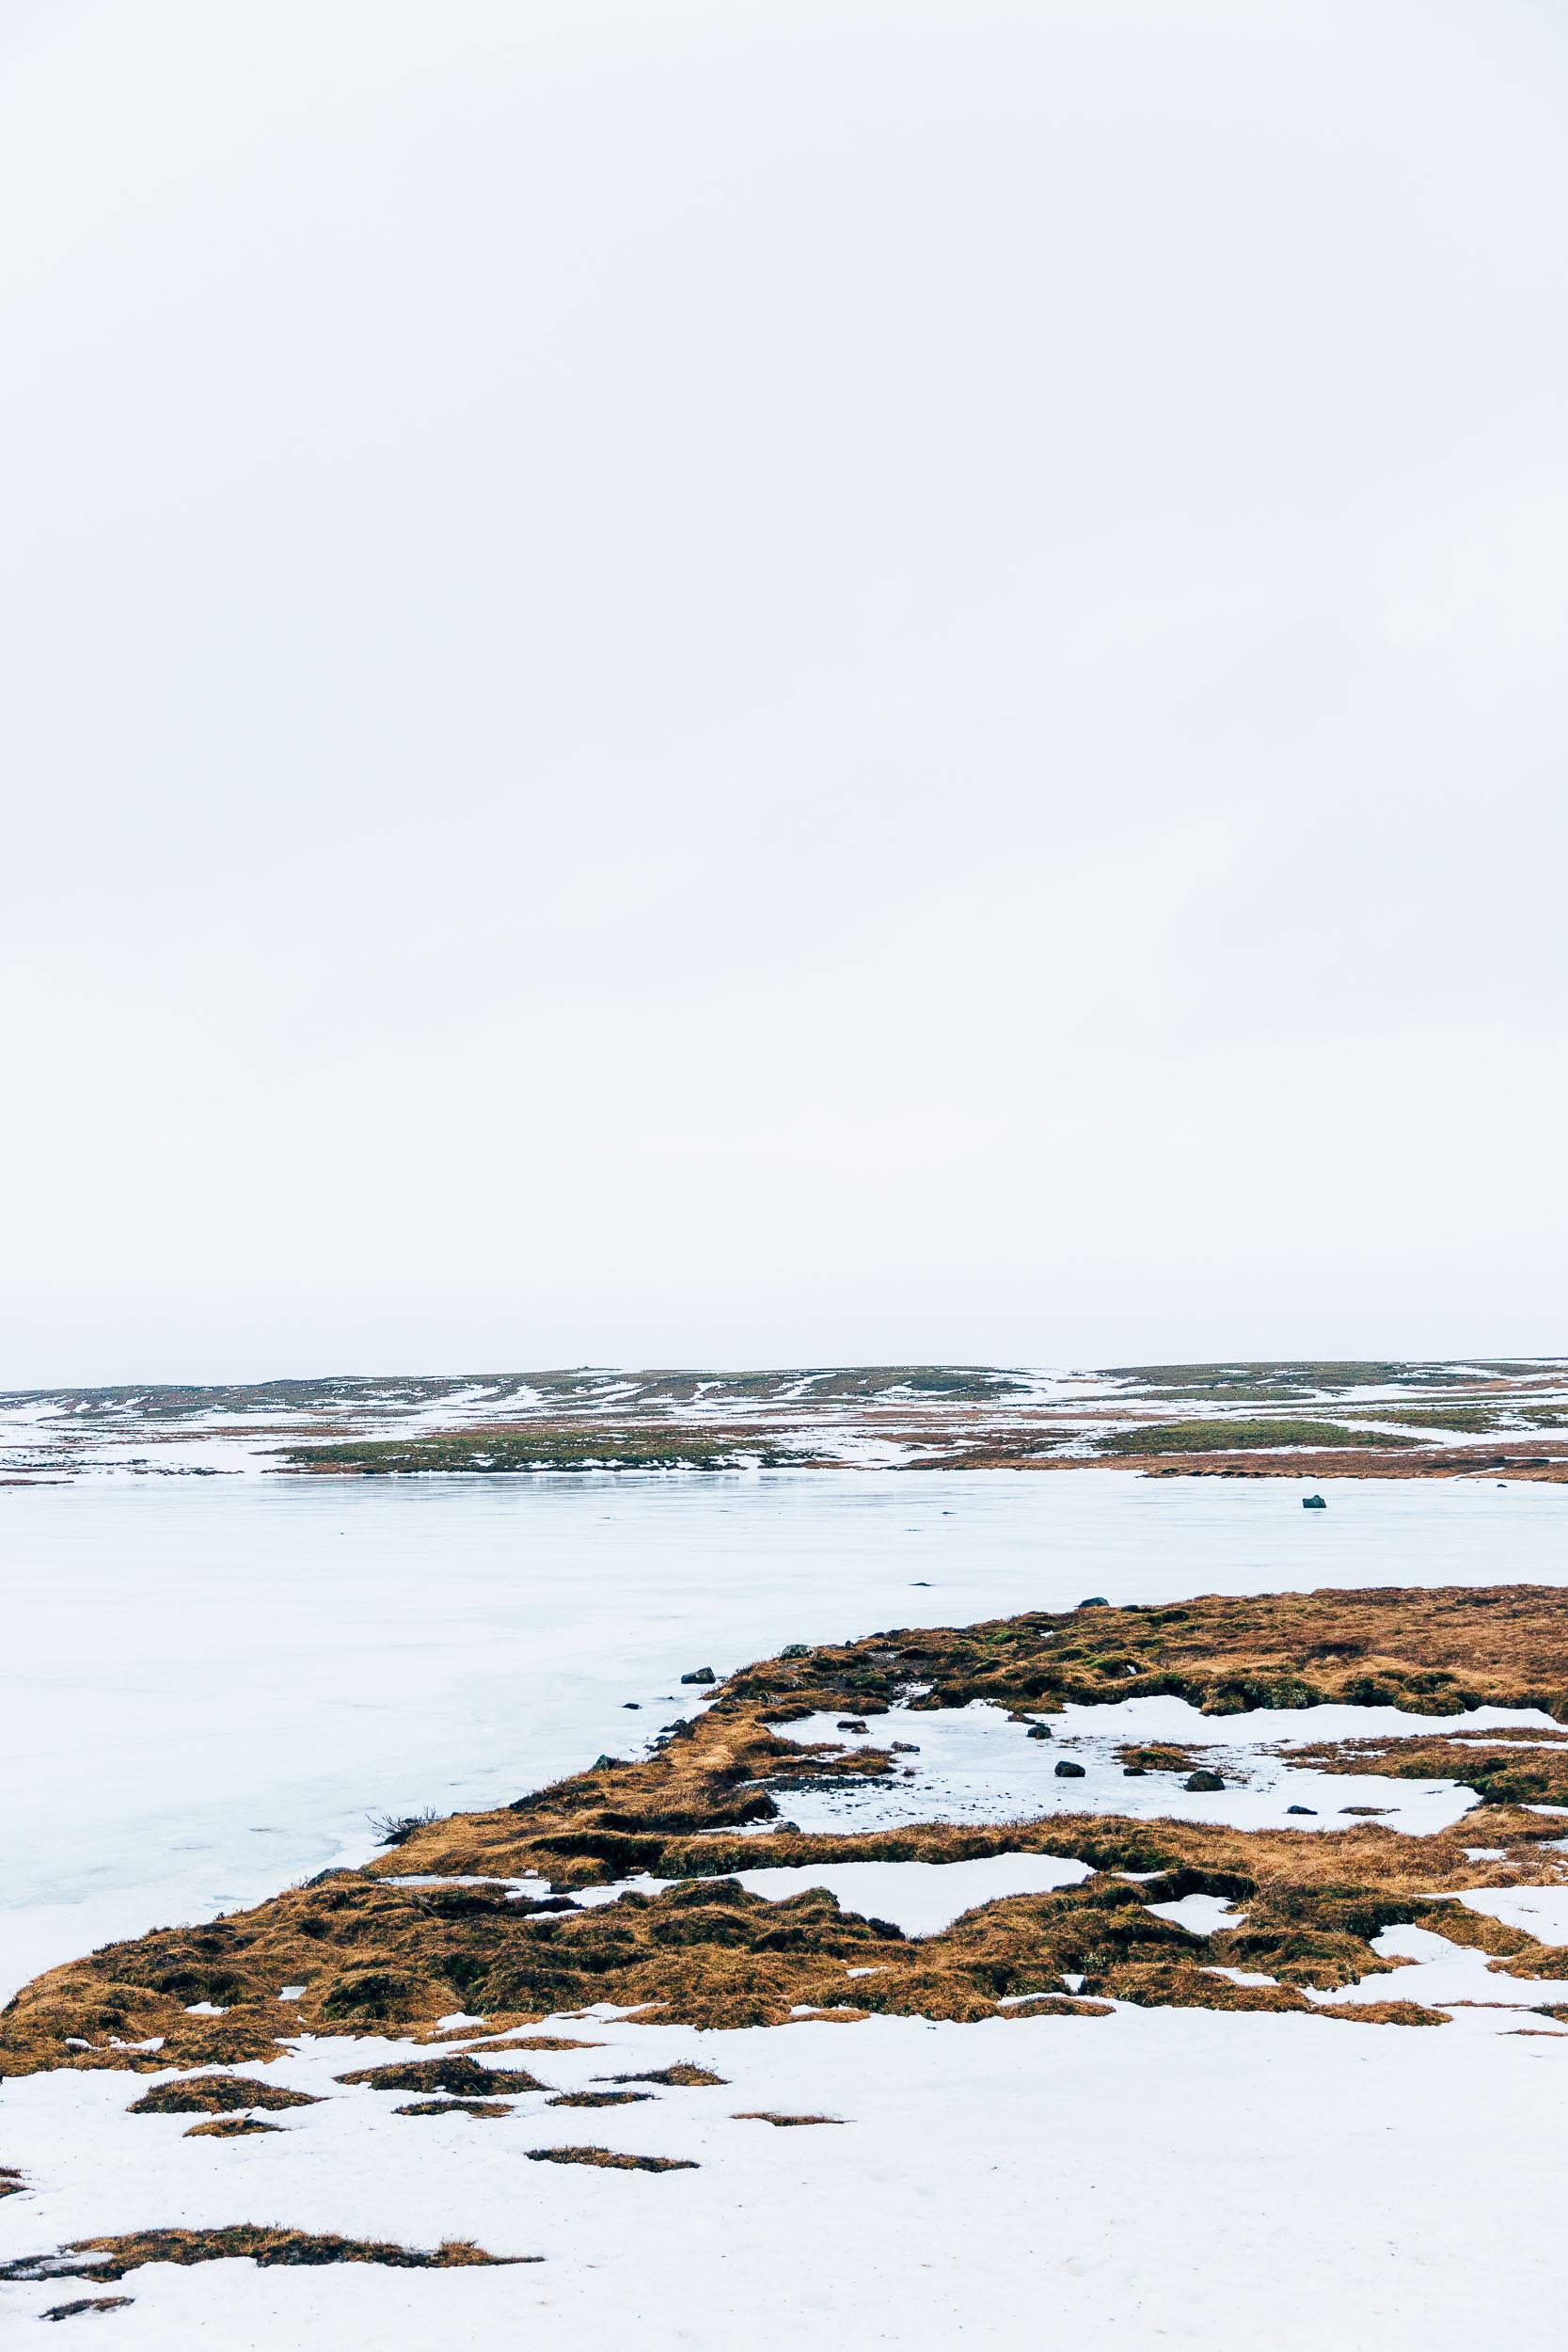 02_2019_Iceland-248.jpg